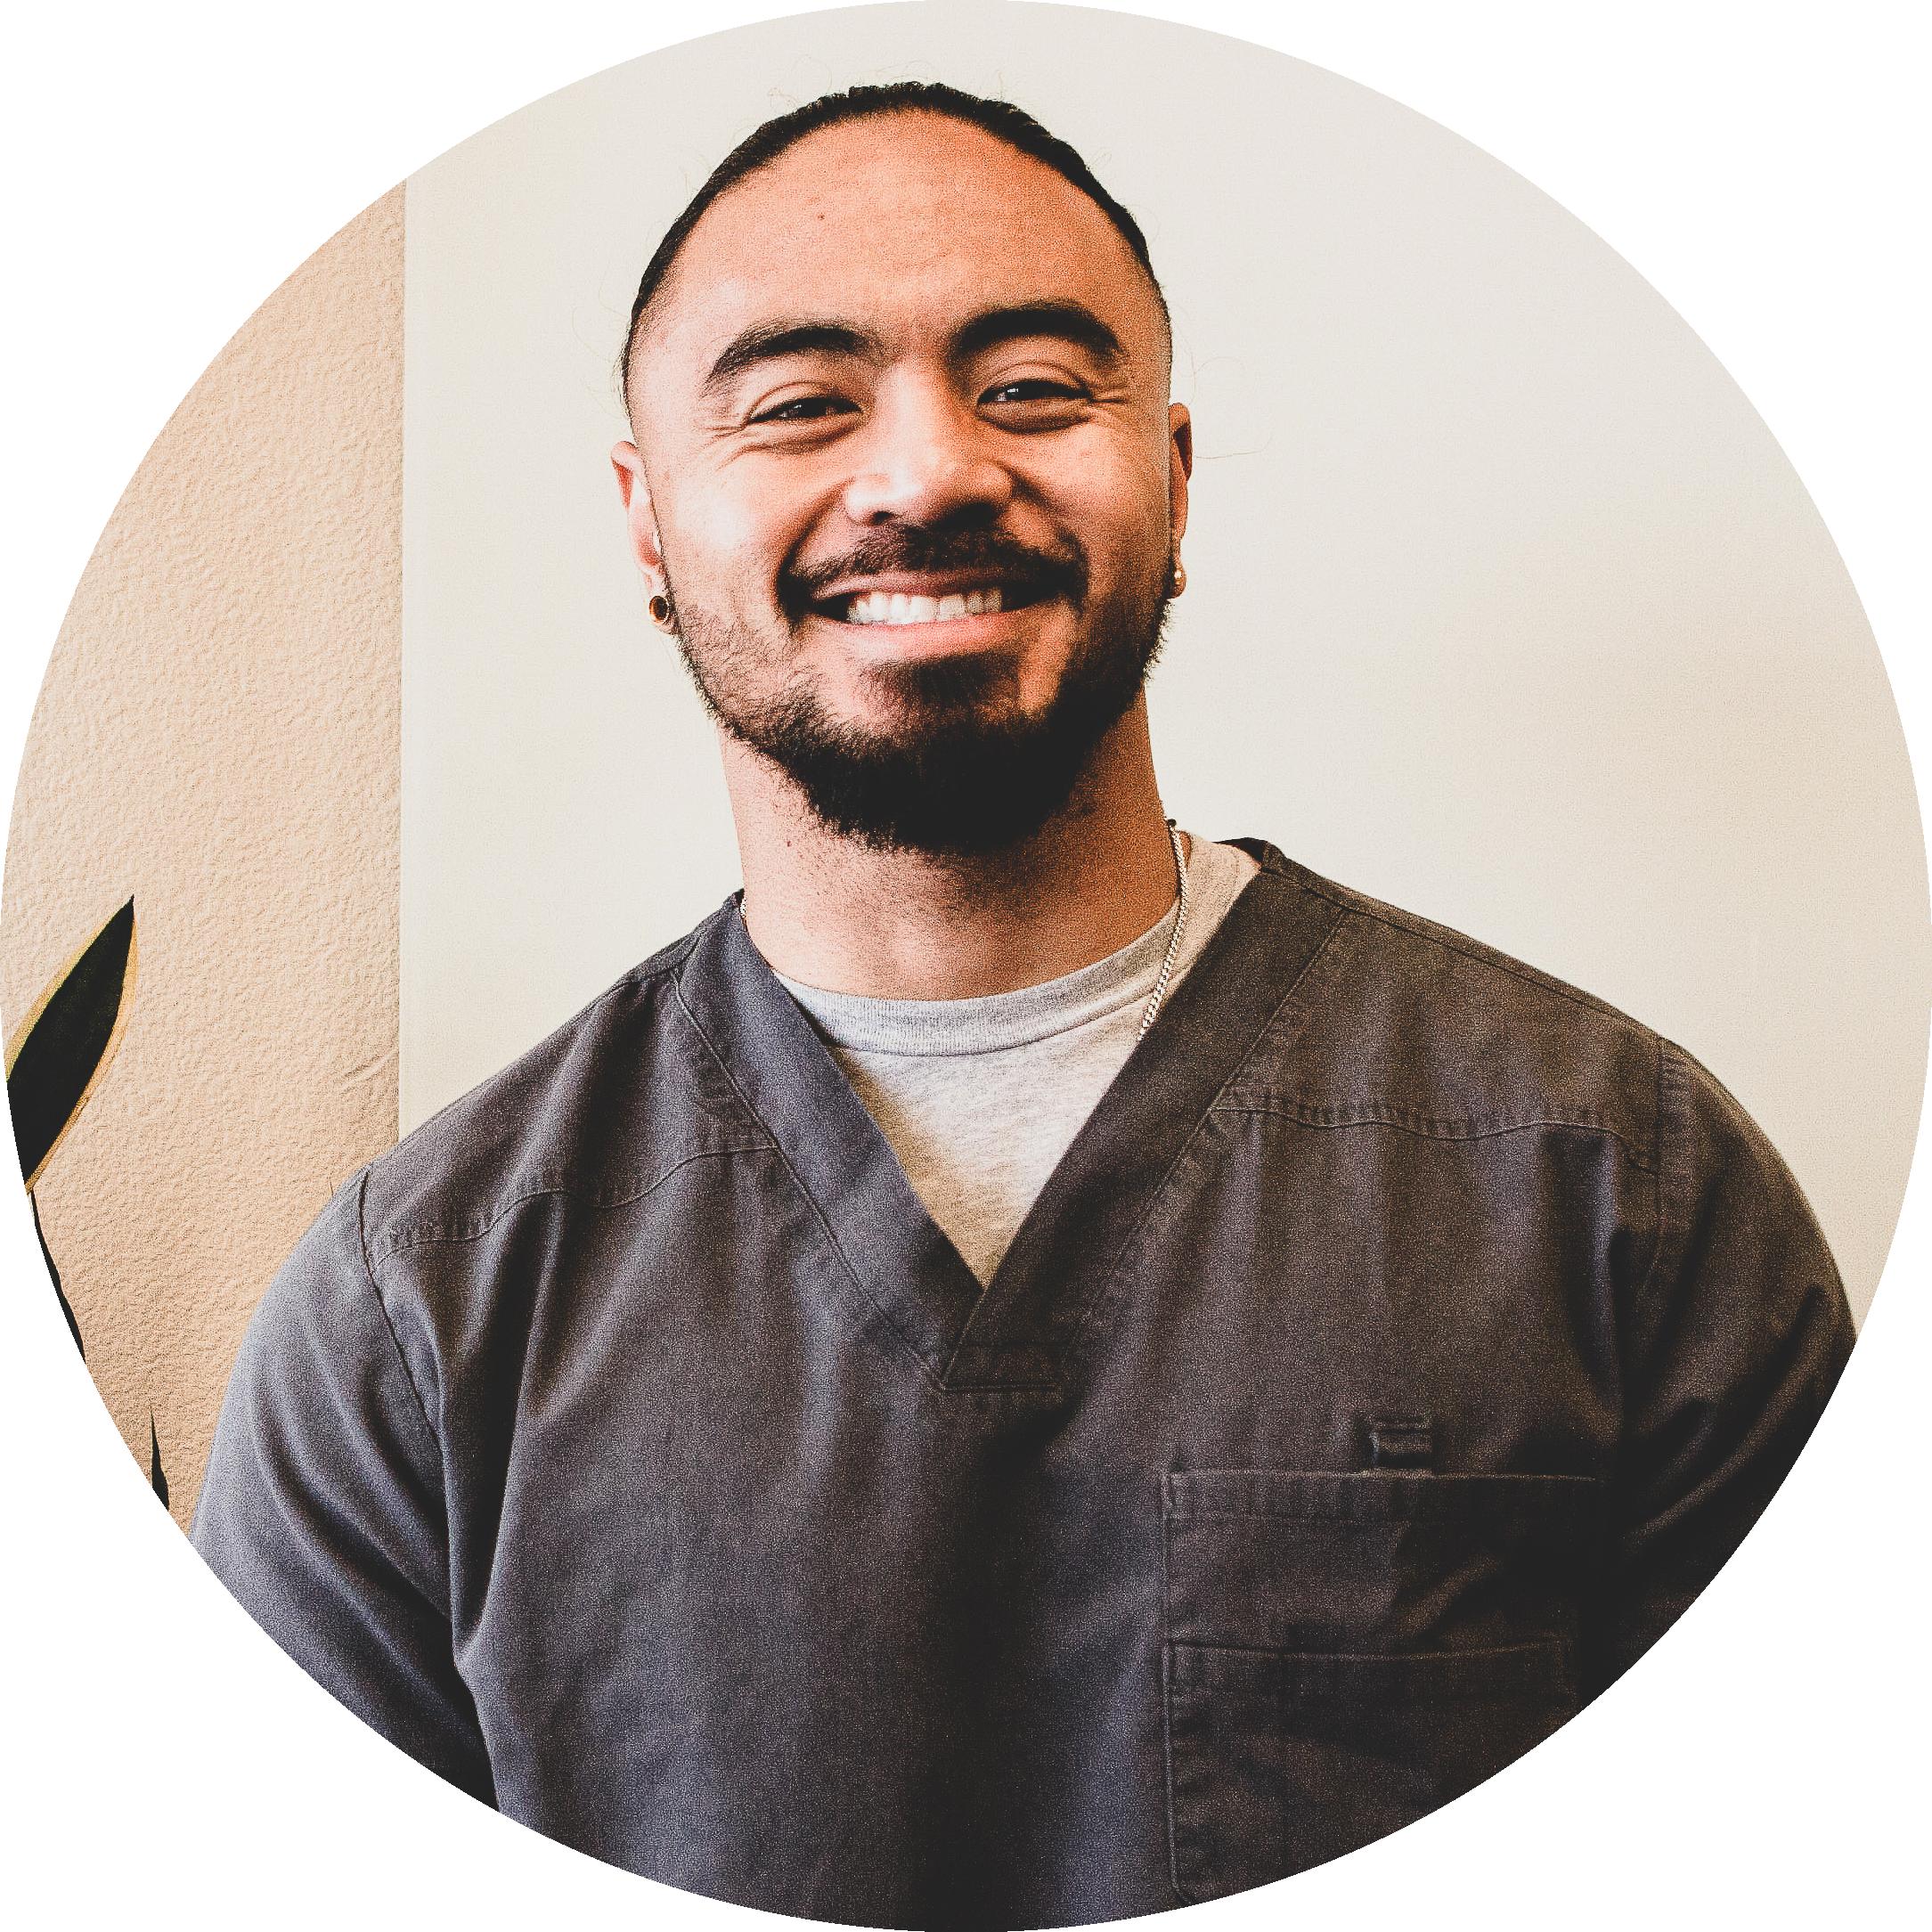 Benedict Samonte, CMTC, NASM-CES - Massage Therapist / Fitness Trainer